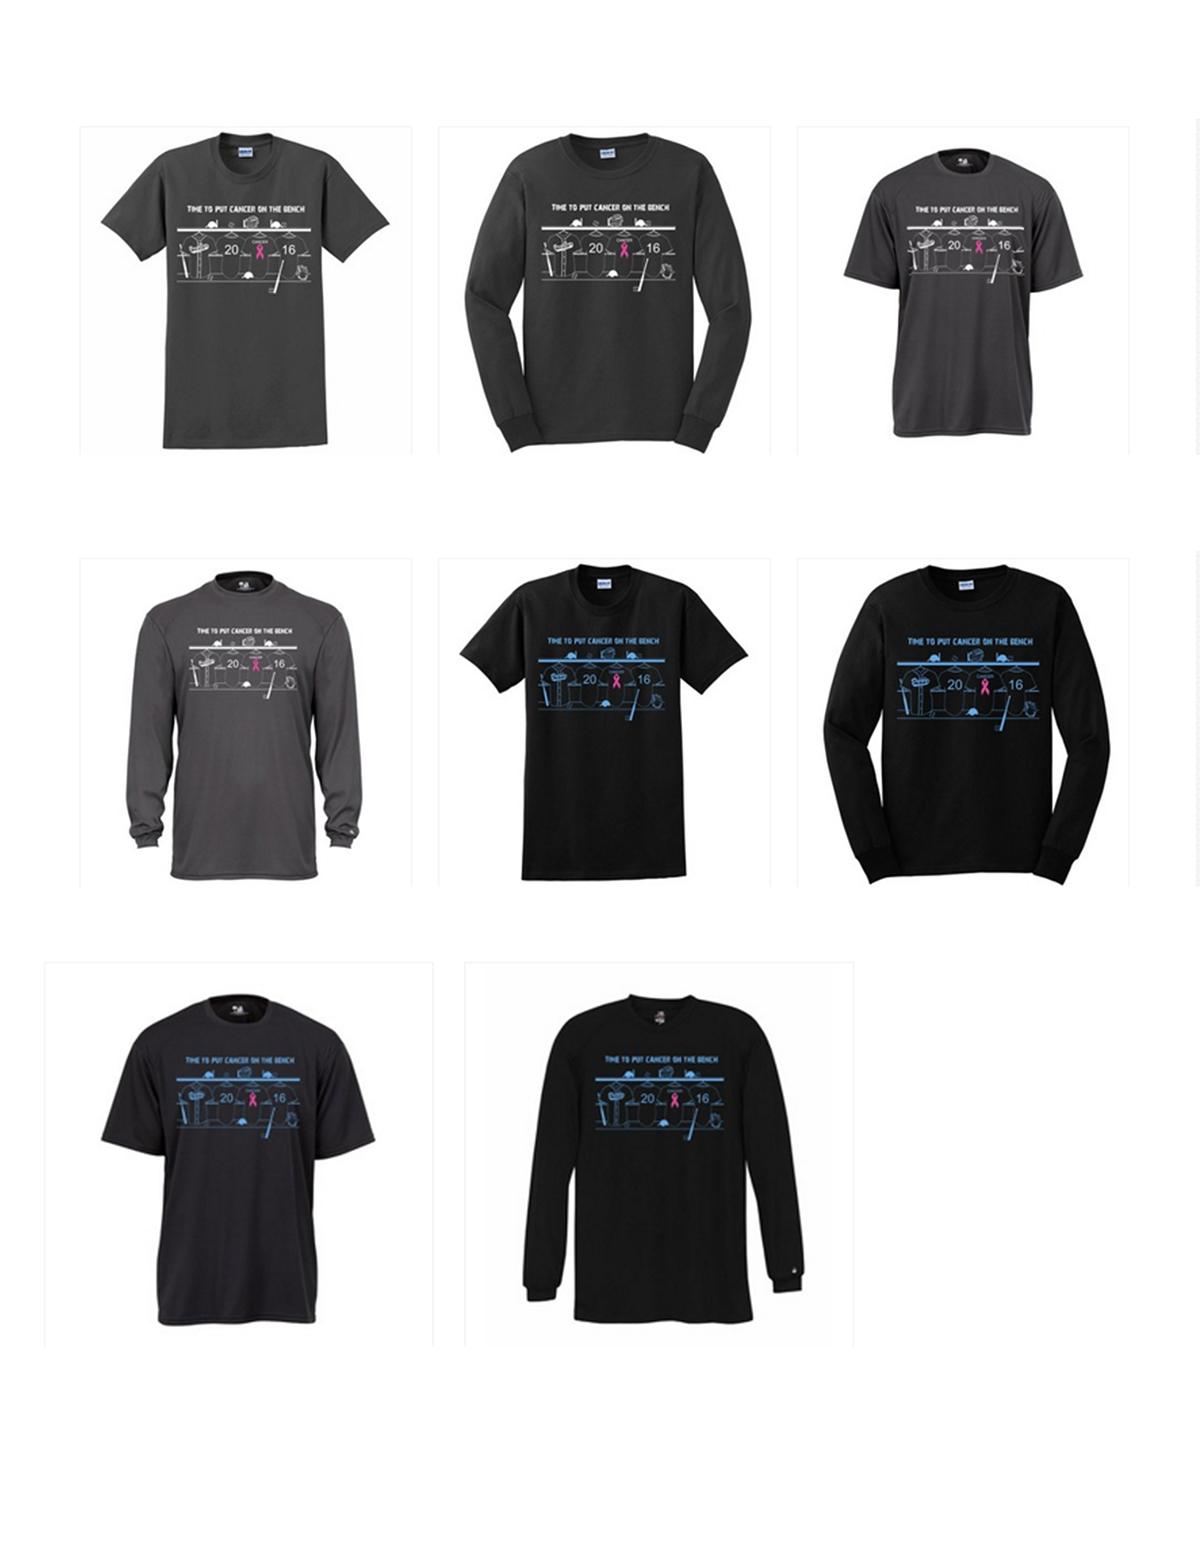 softball photoshop tshirt t-shirt design Clothing clothing design